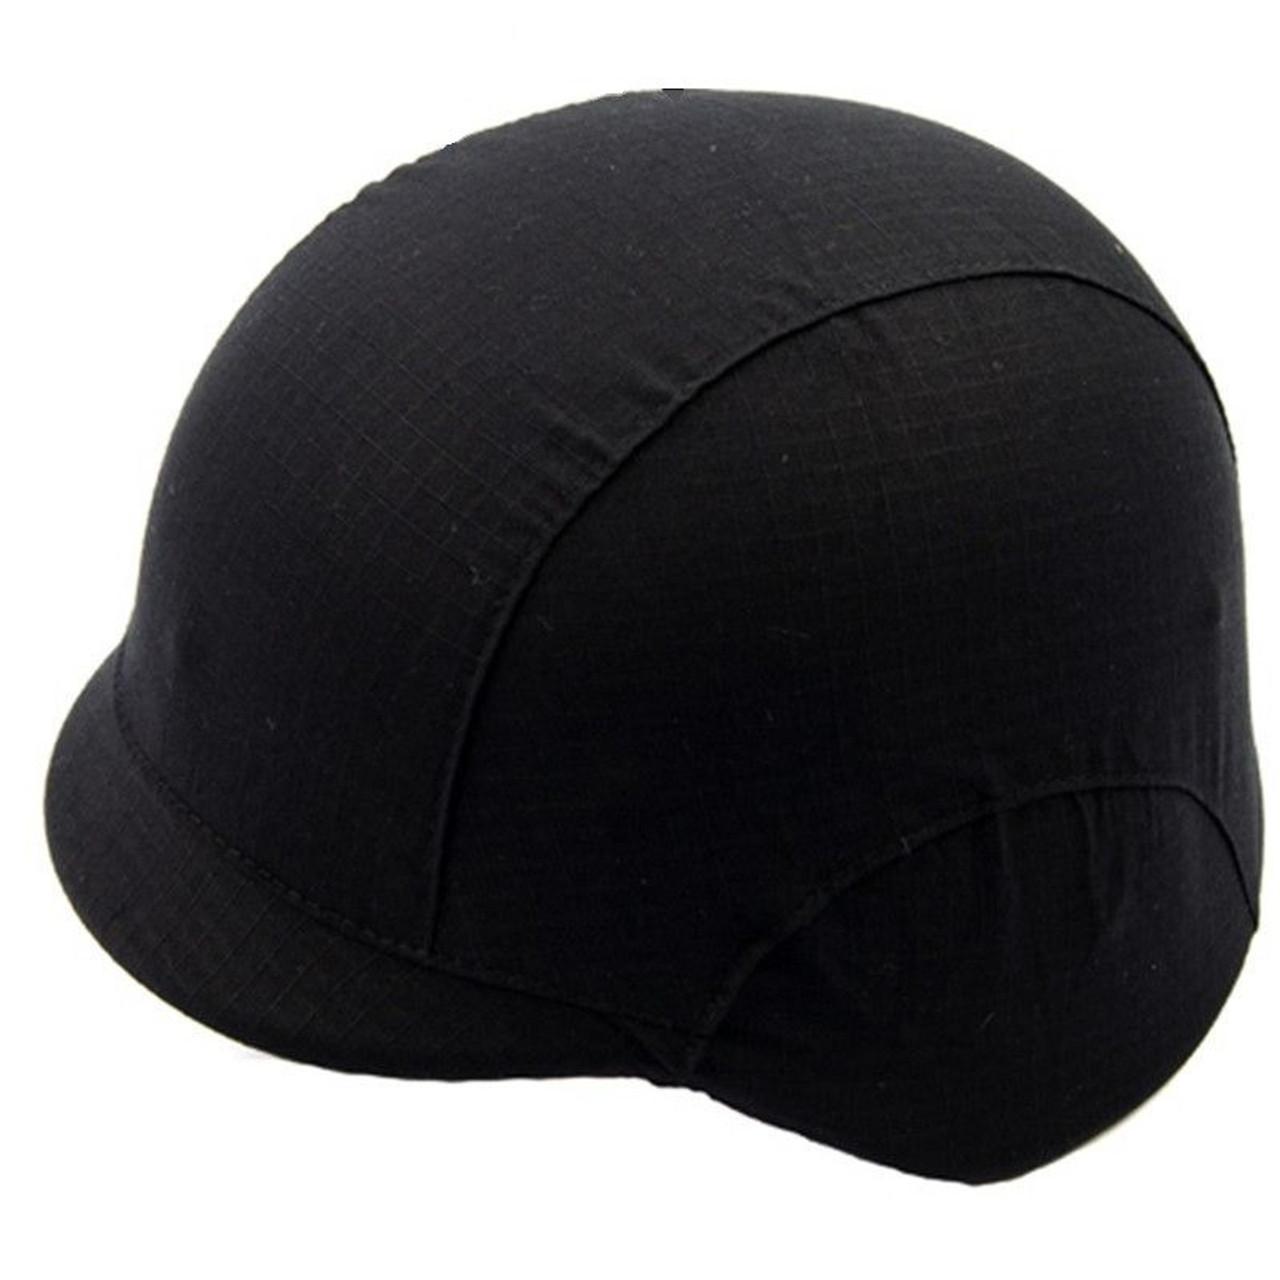 PASGT ballistic helmet, black, NIJ III-A